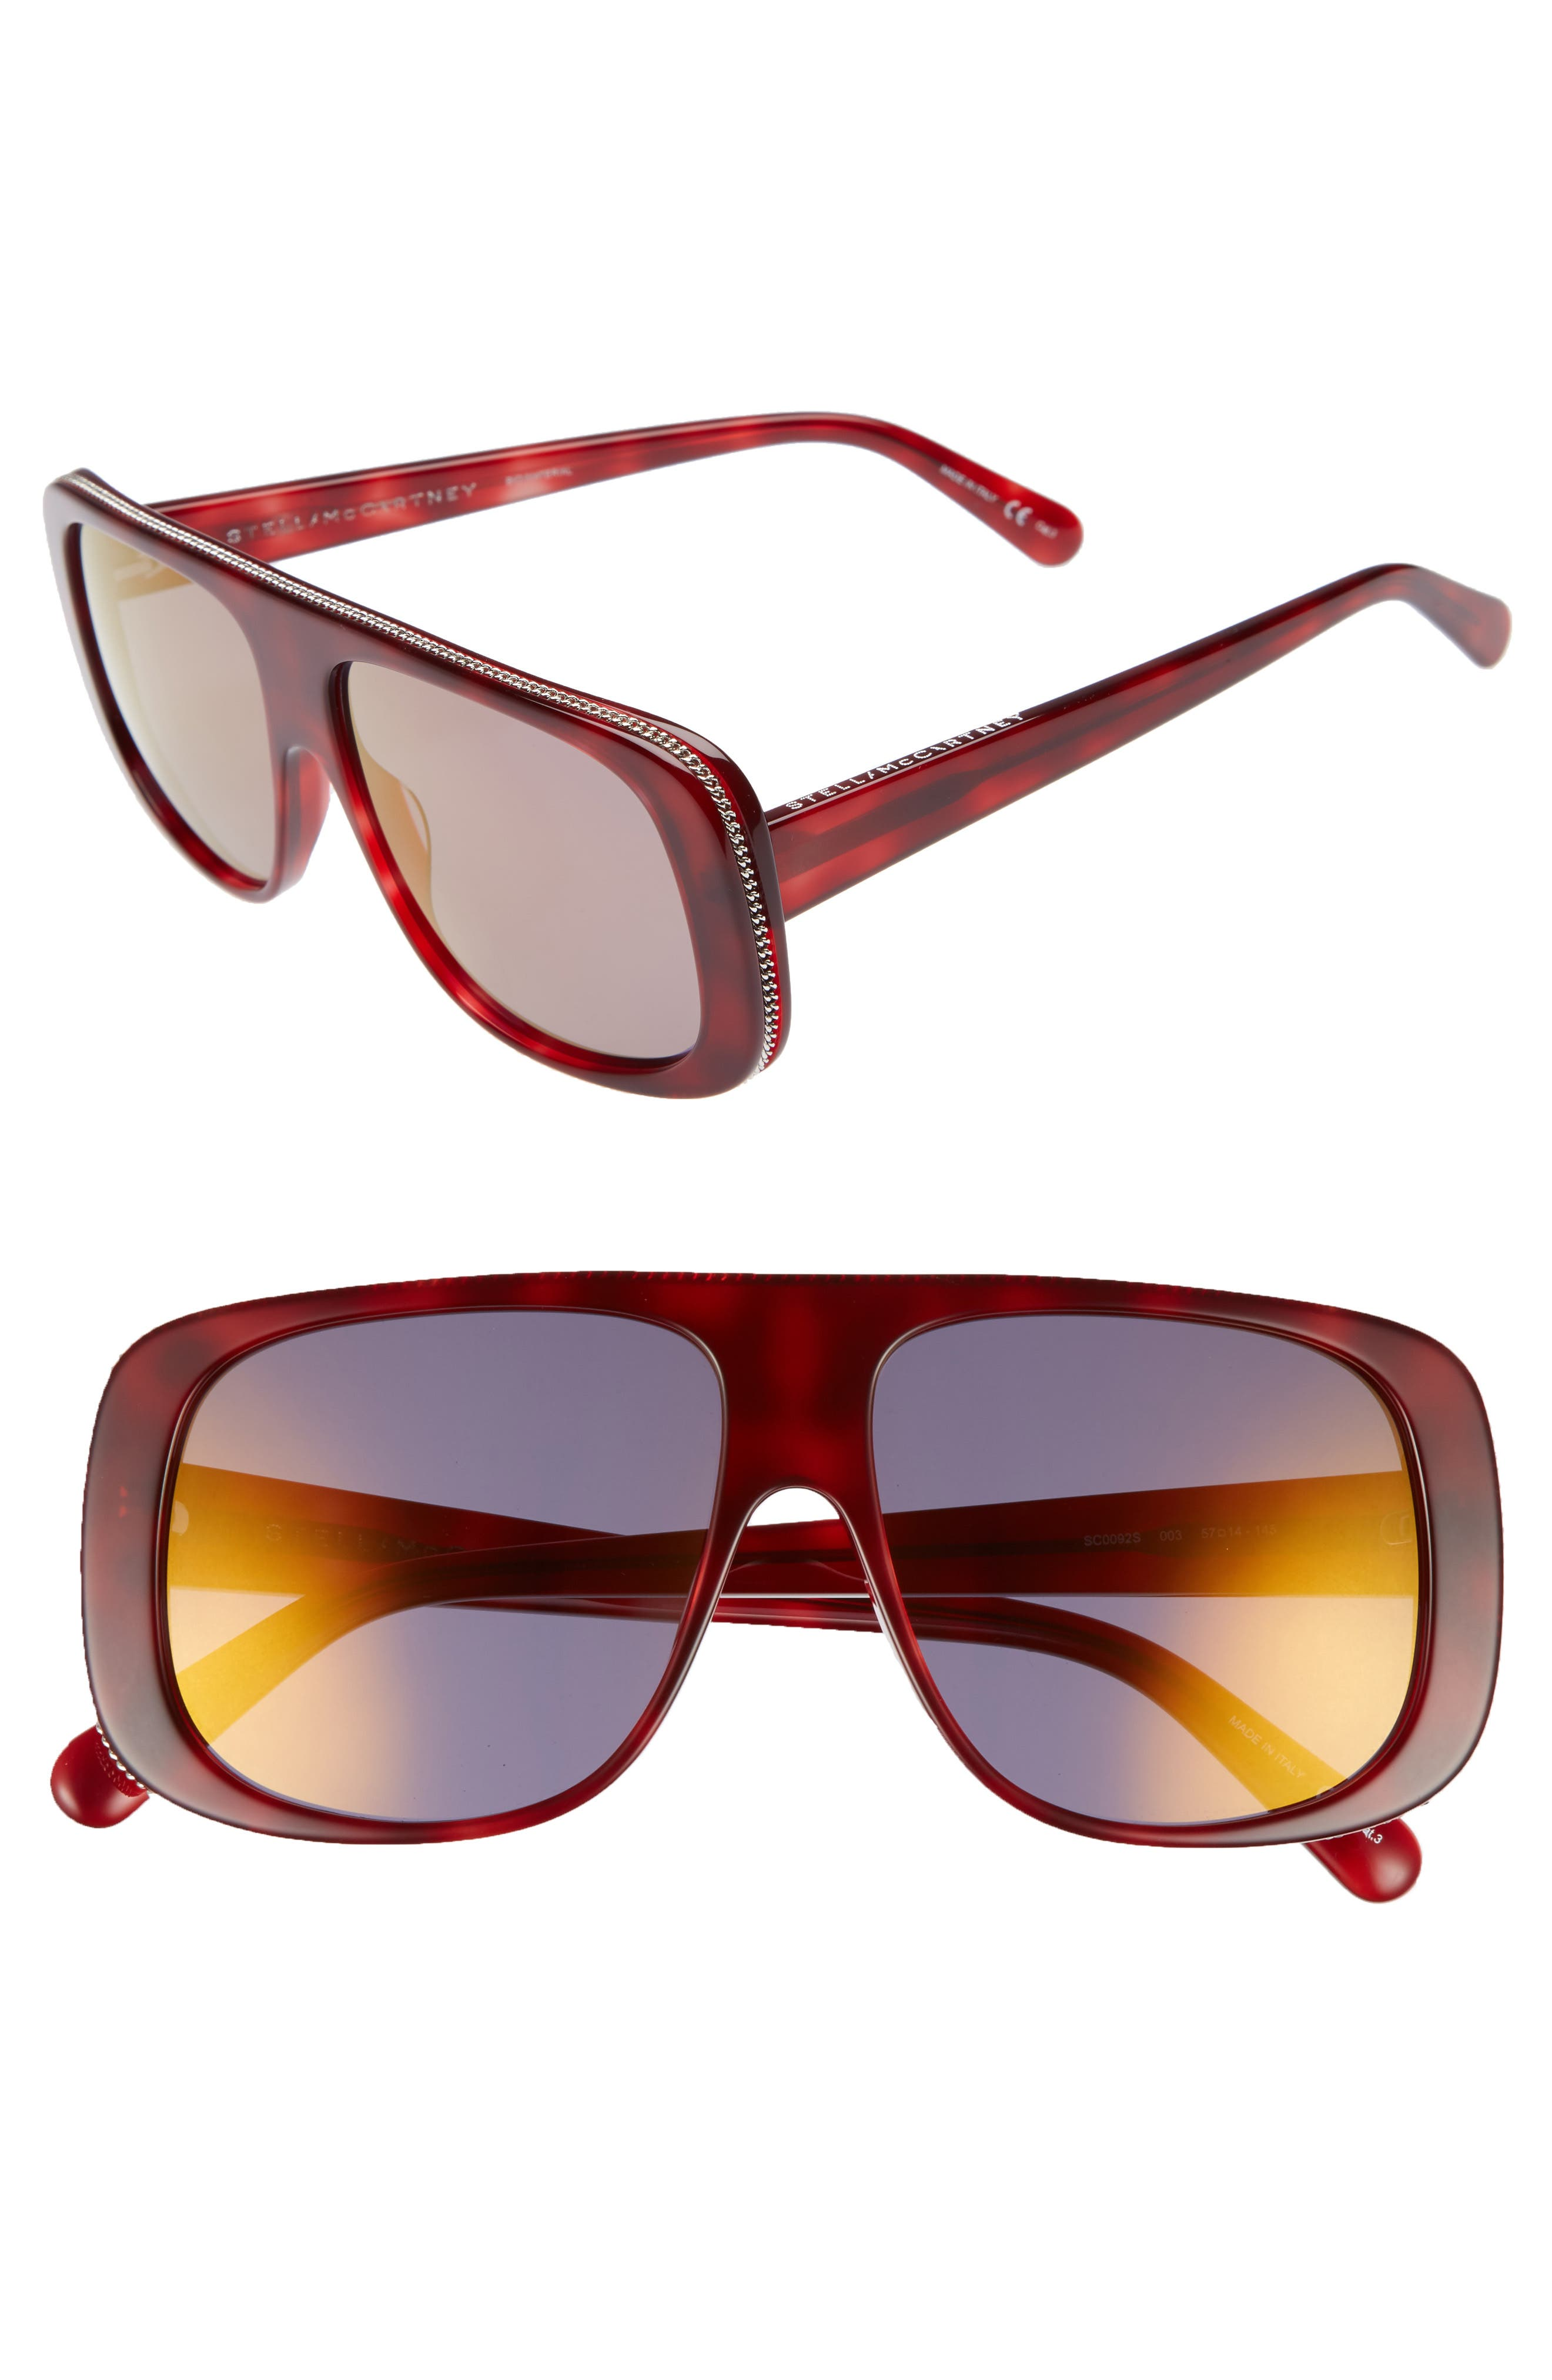 57mm Flat Top Sunglasses,                             Main thumbnail 1, color,                             Avana